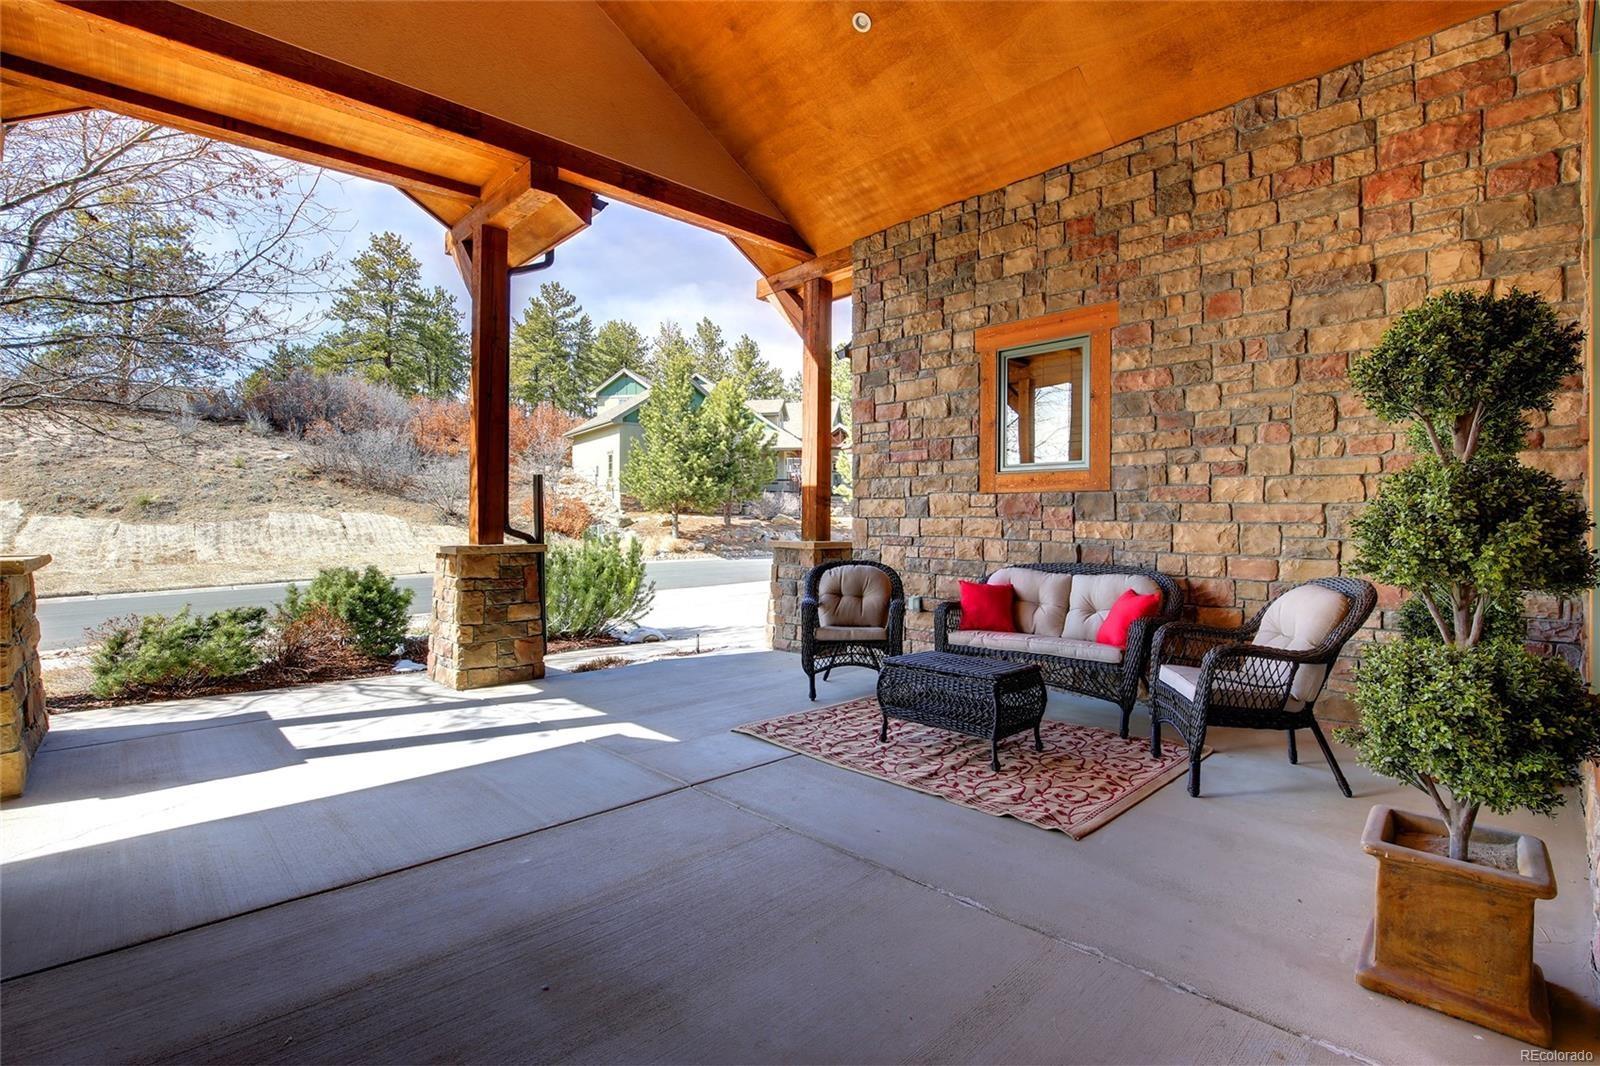 MLS# 4879945 - 5 - 2392 Saddleback Drive, Castle Rock, CO 80104